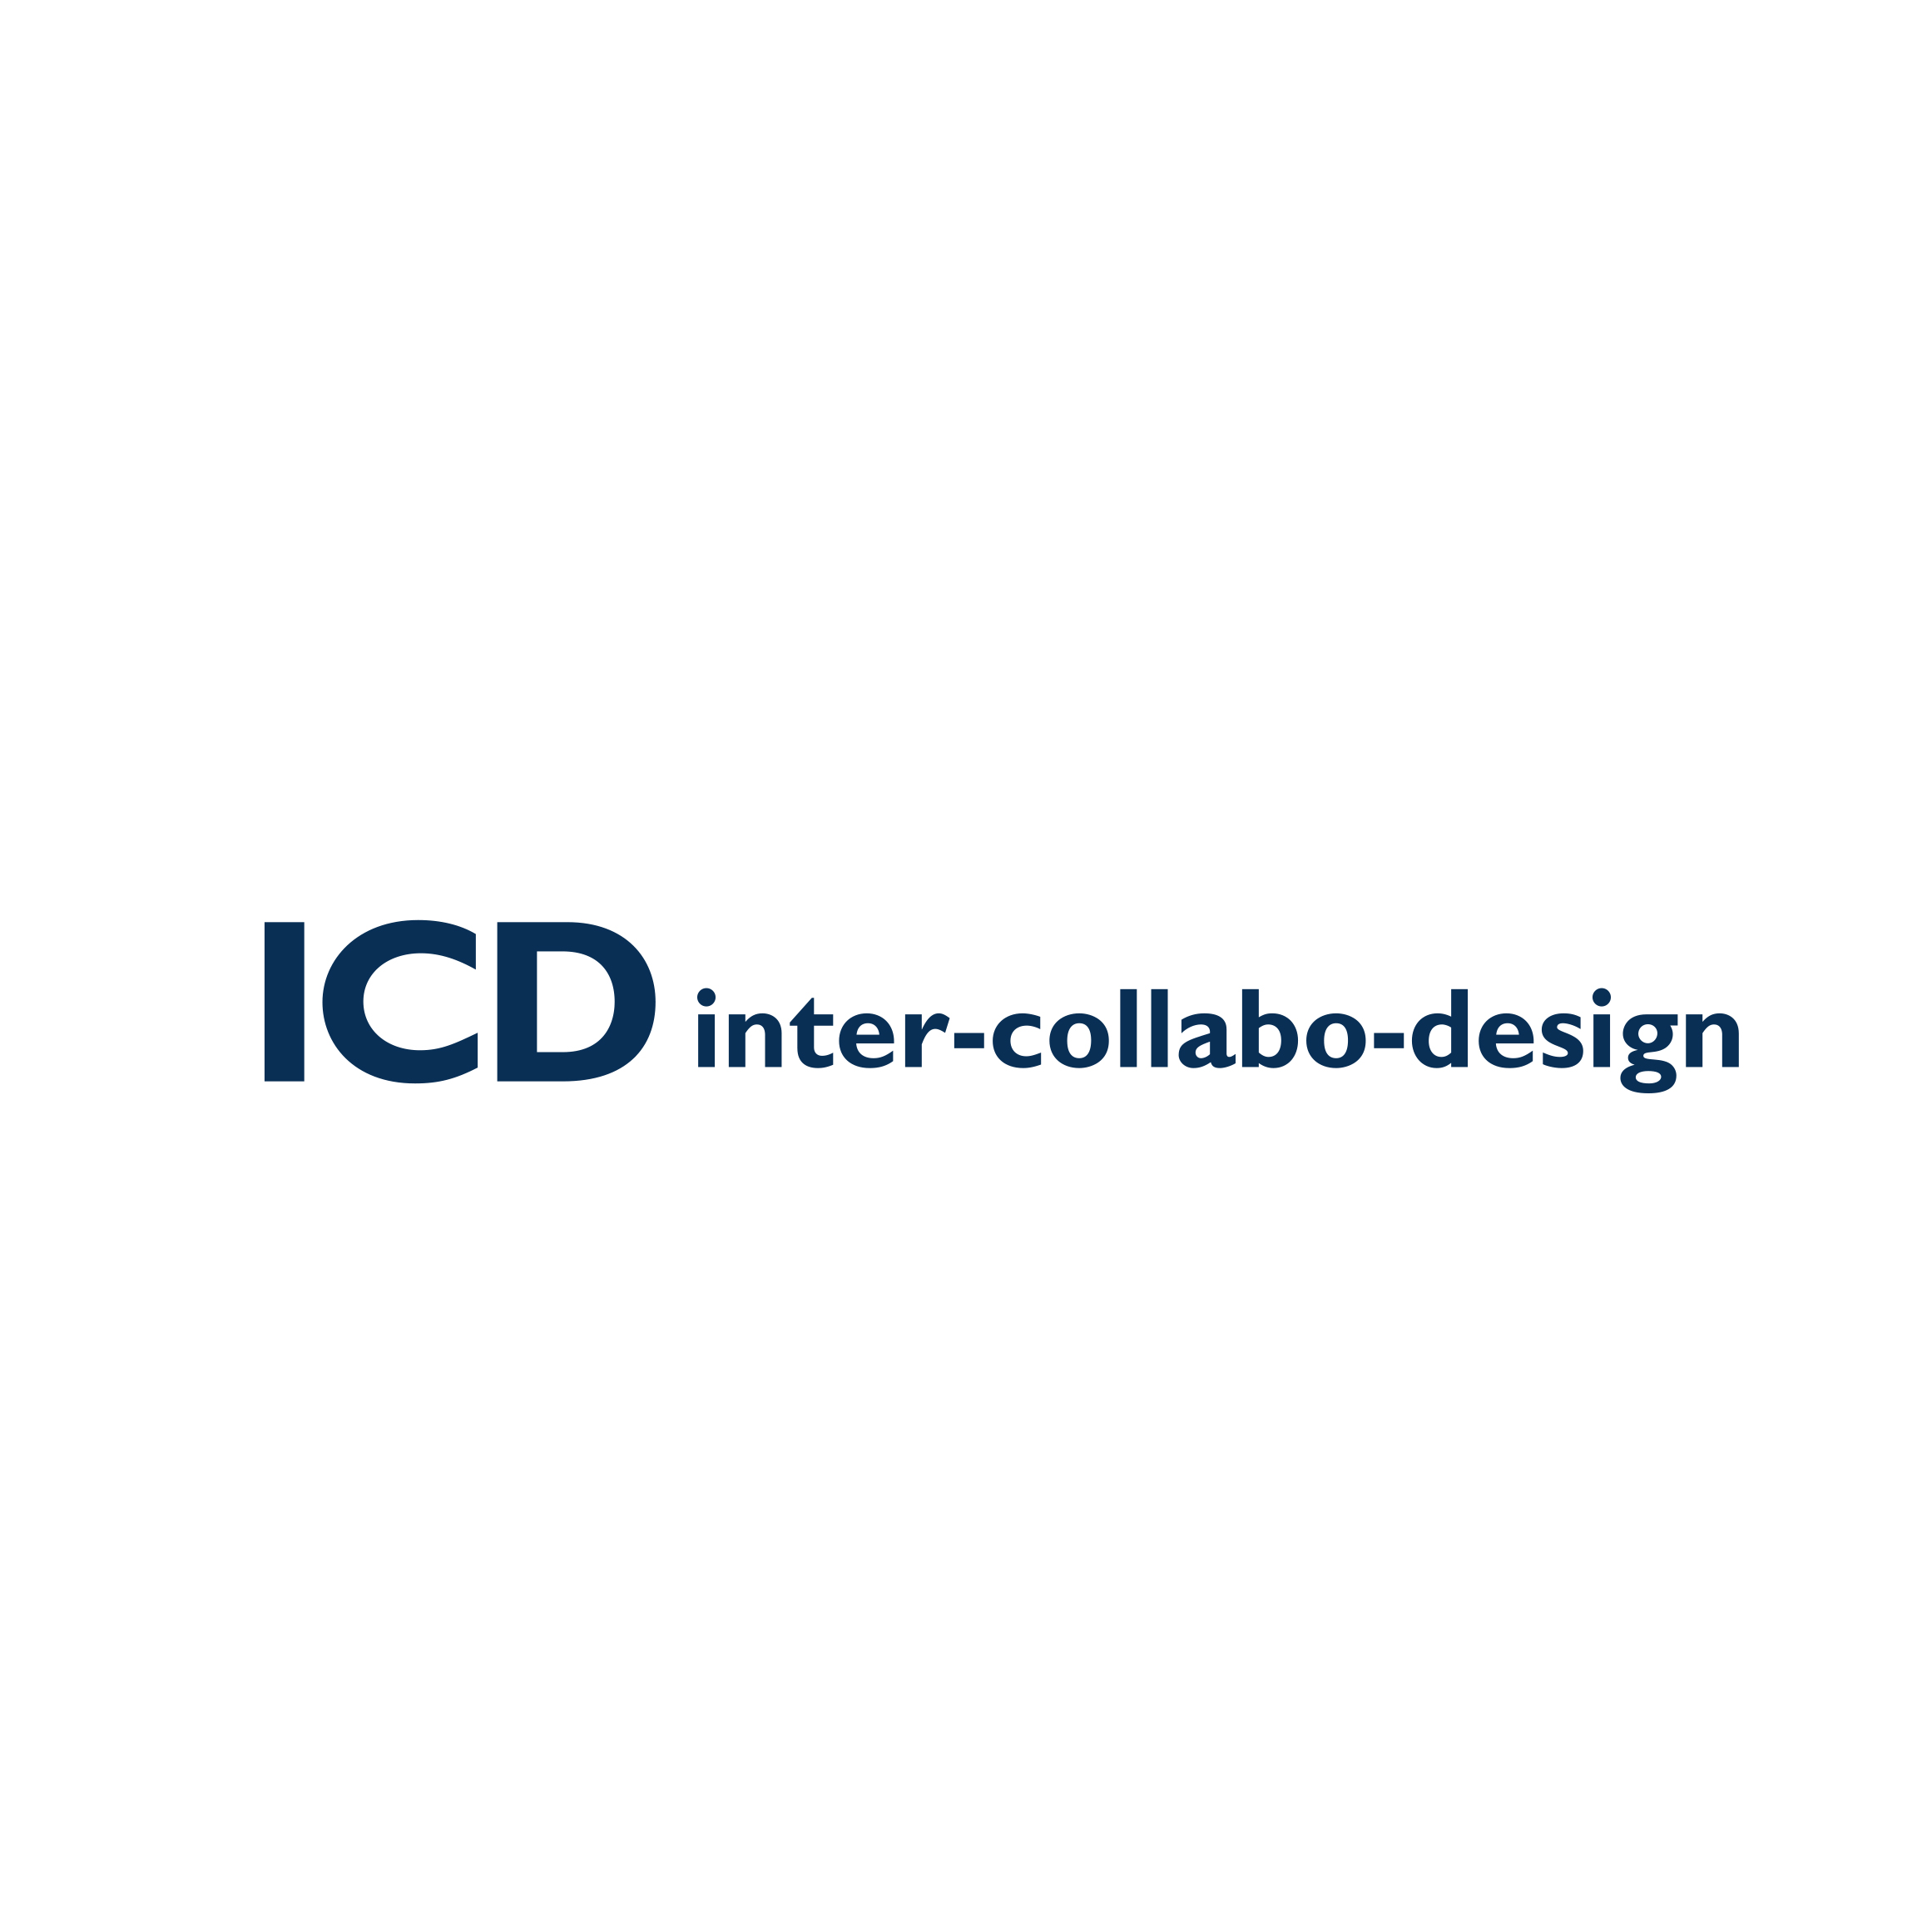 ICDロゴ